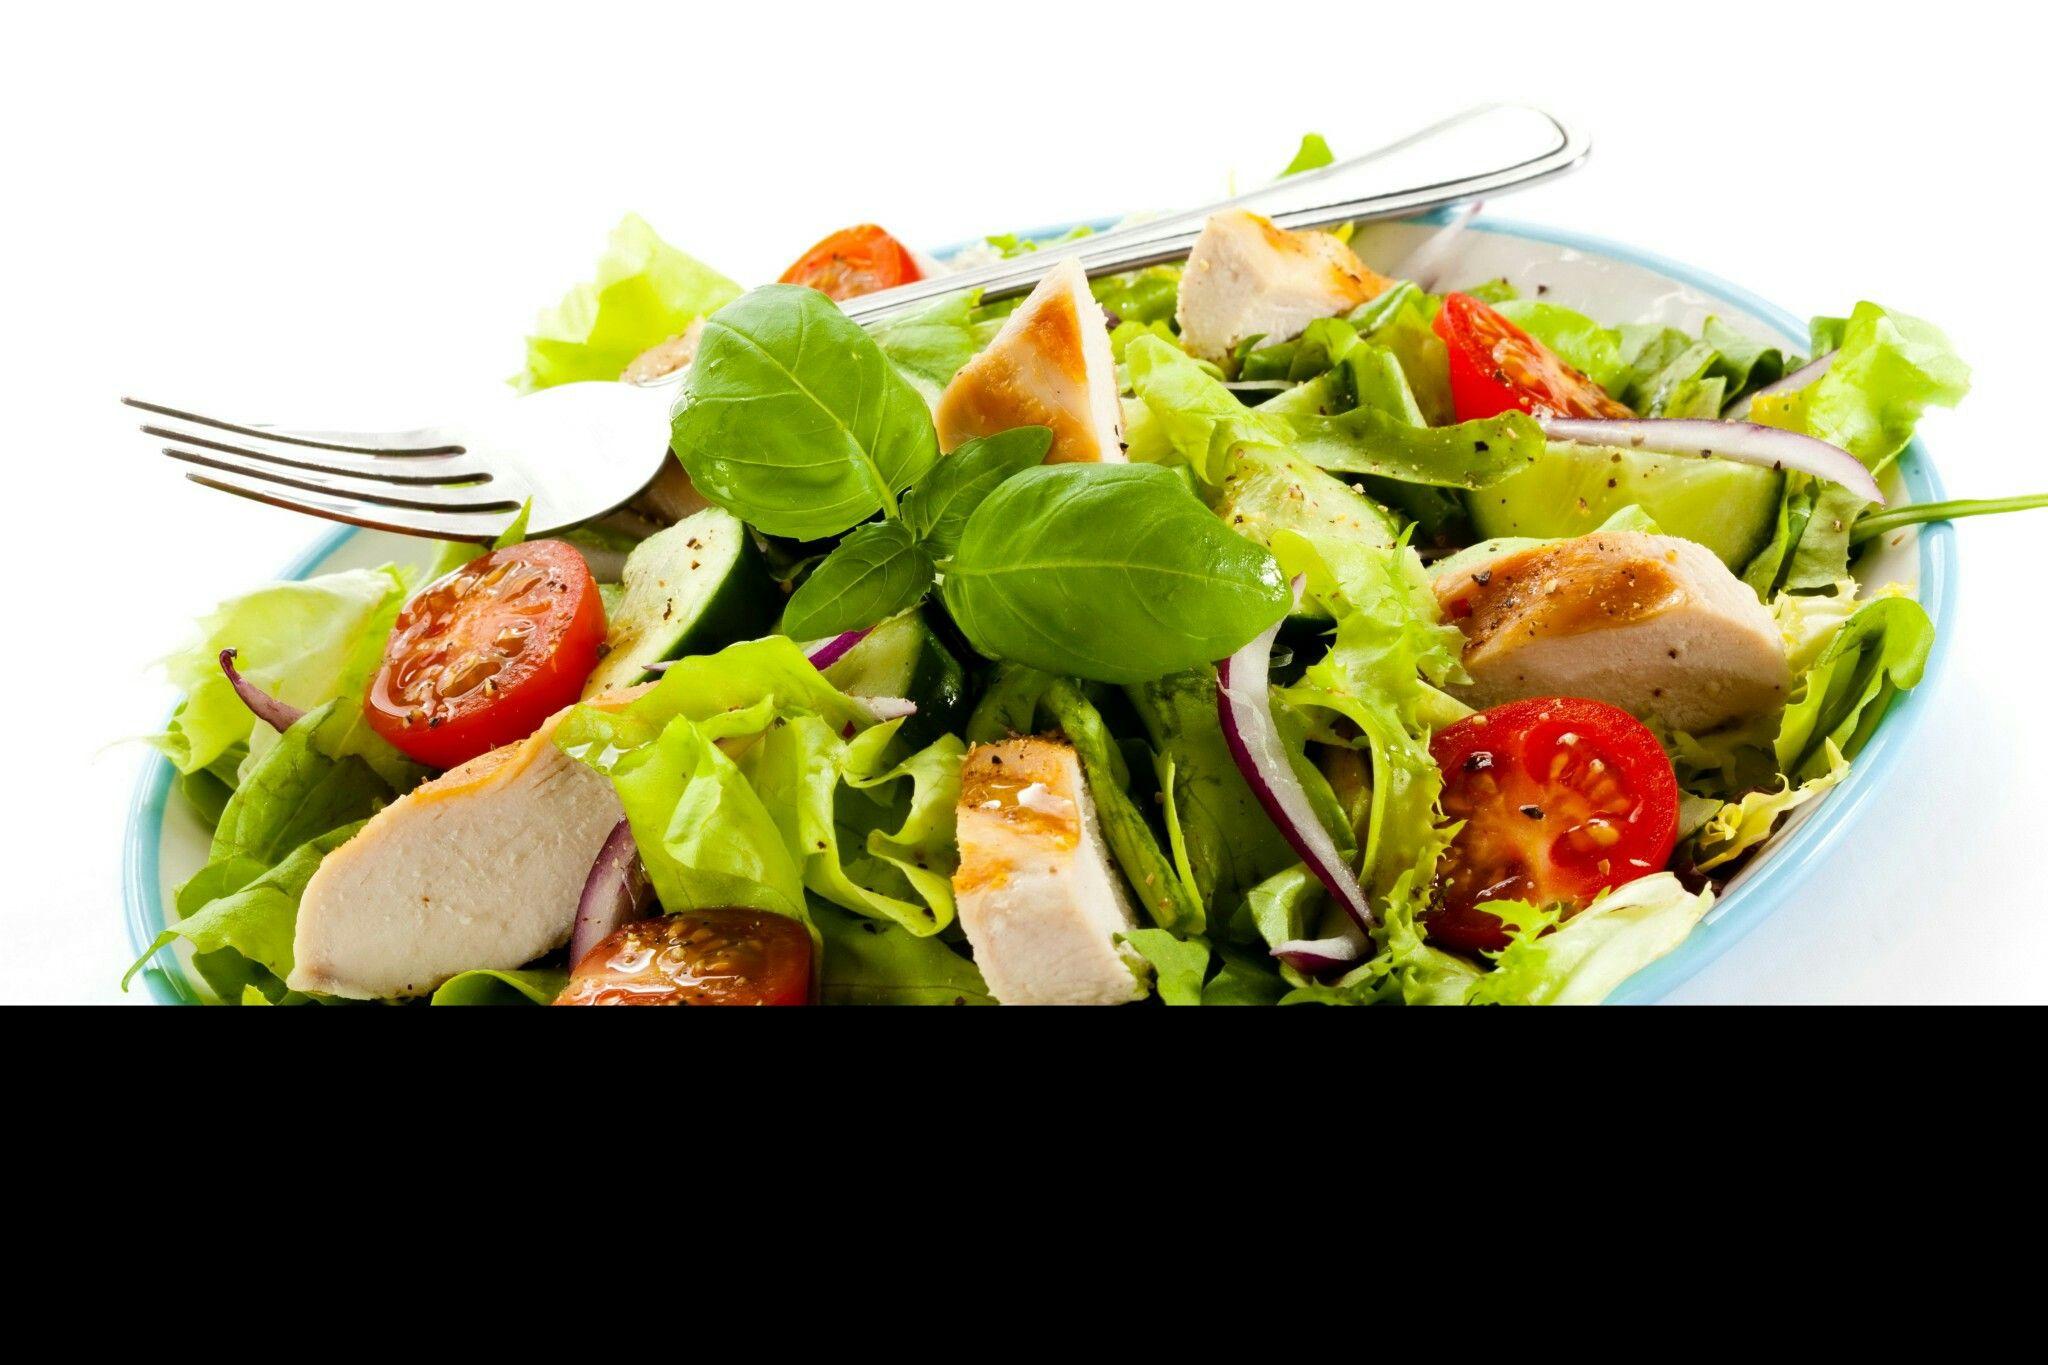 Generic salad, Blake wants to make it